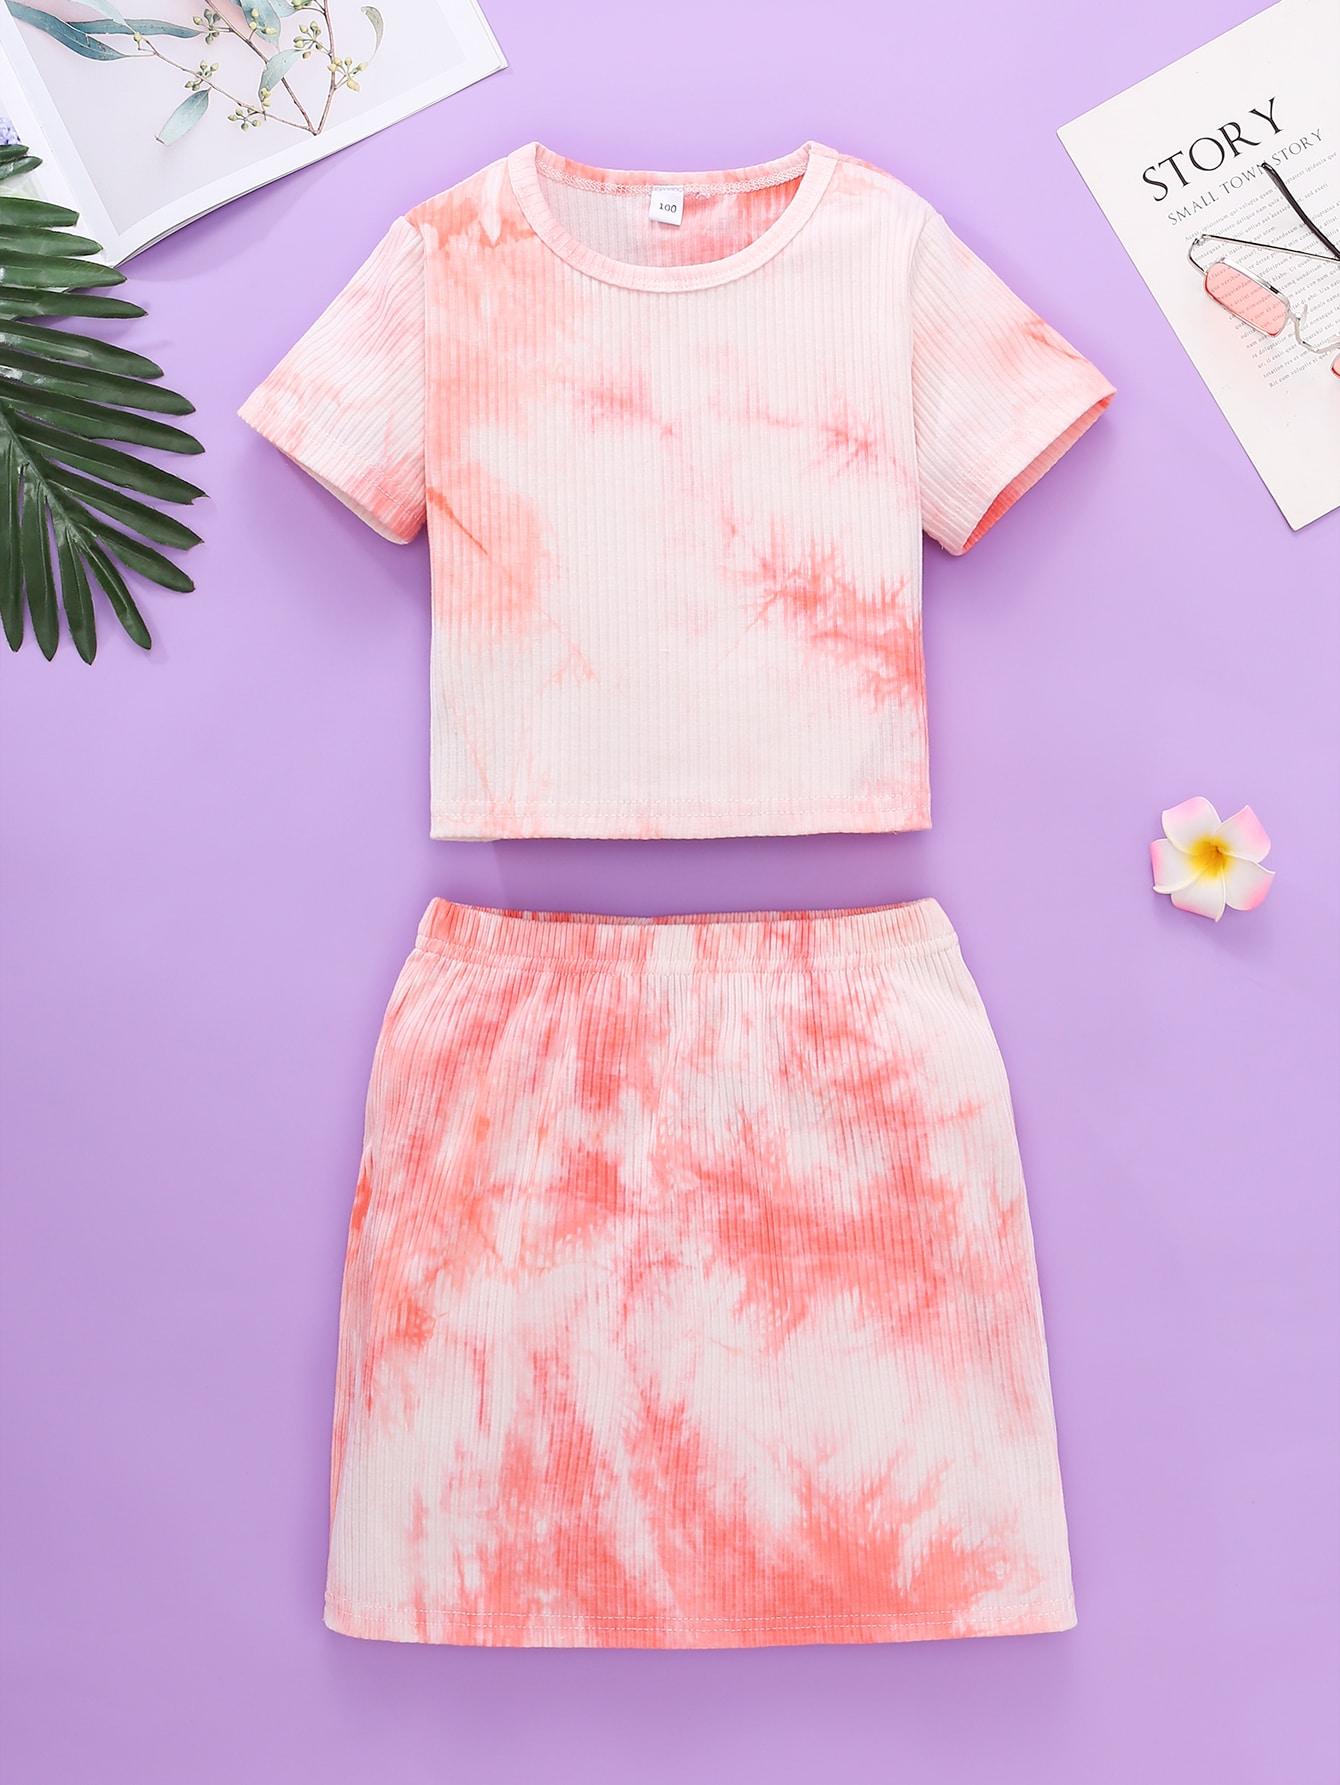 Toddler Girls Tie Dye Tee With Skirt